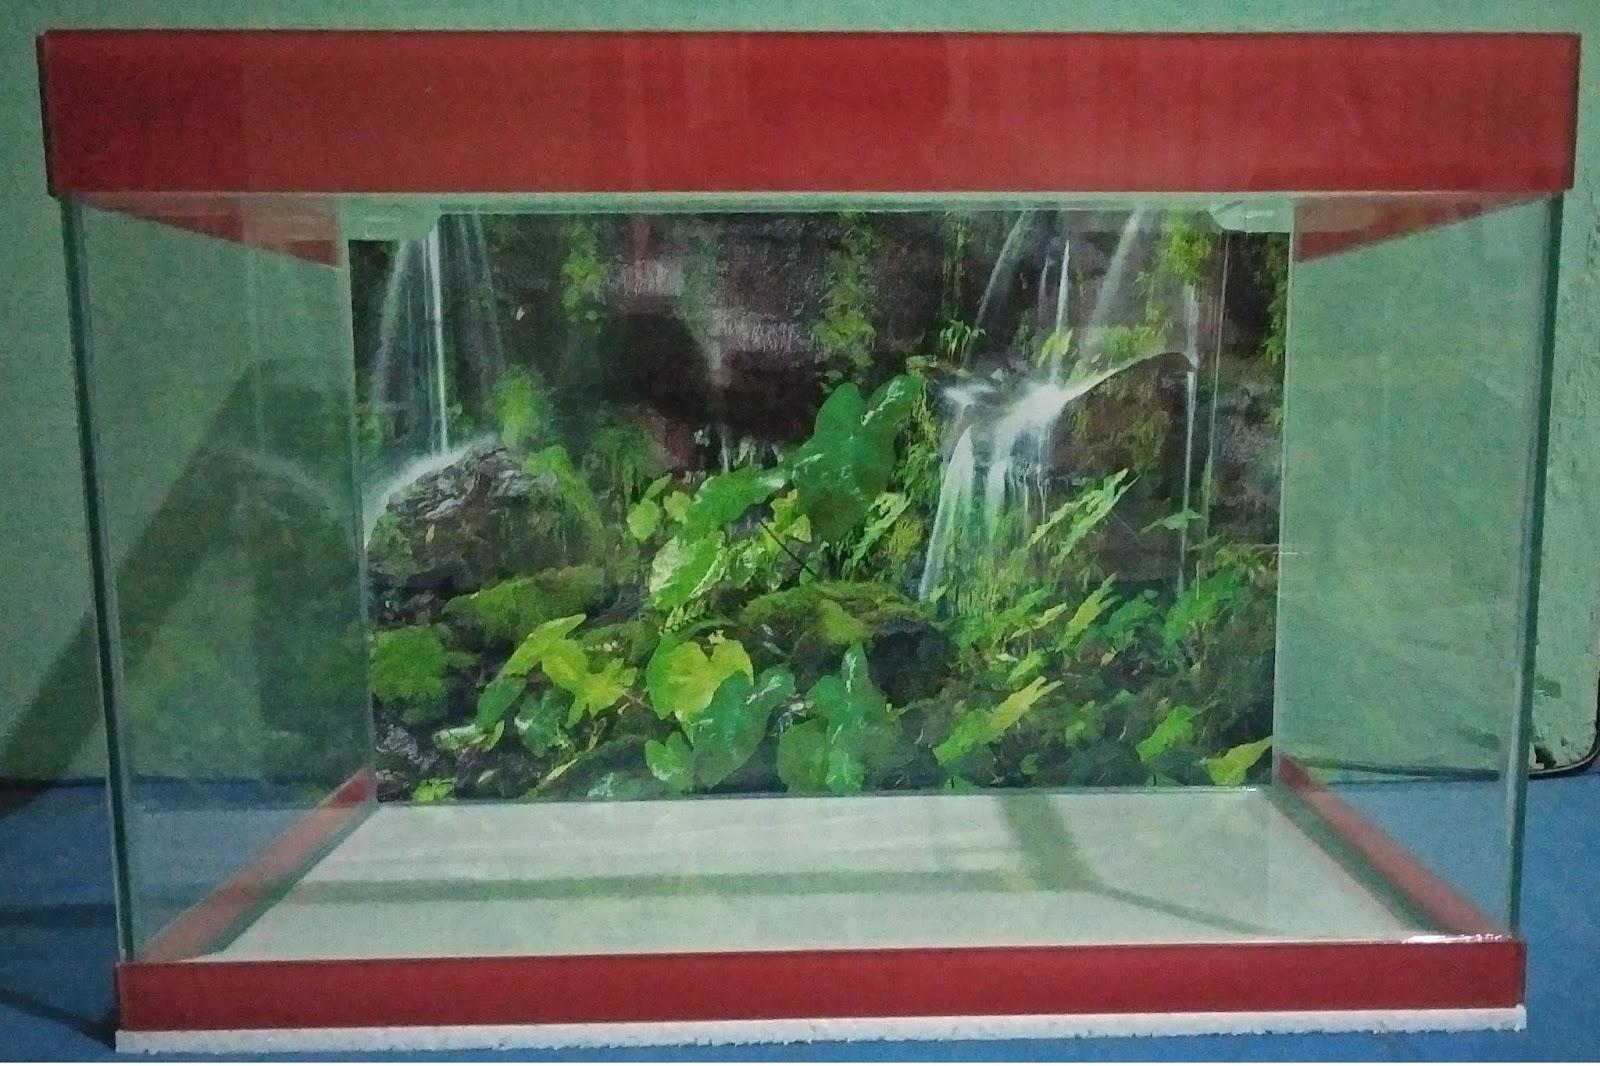 Download 5500 Koleksi Background Aquarium Jogja HD Gratis